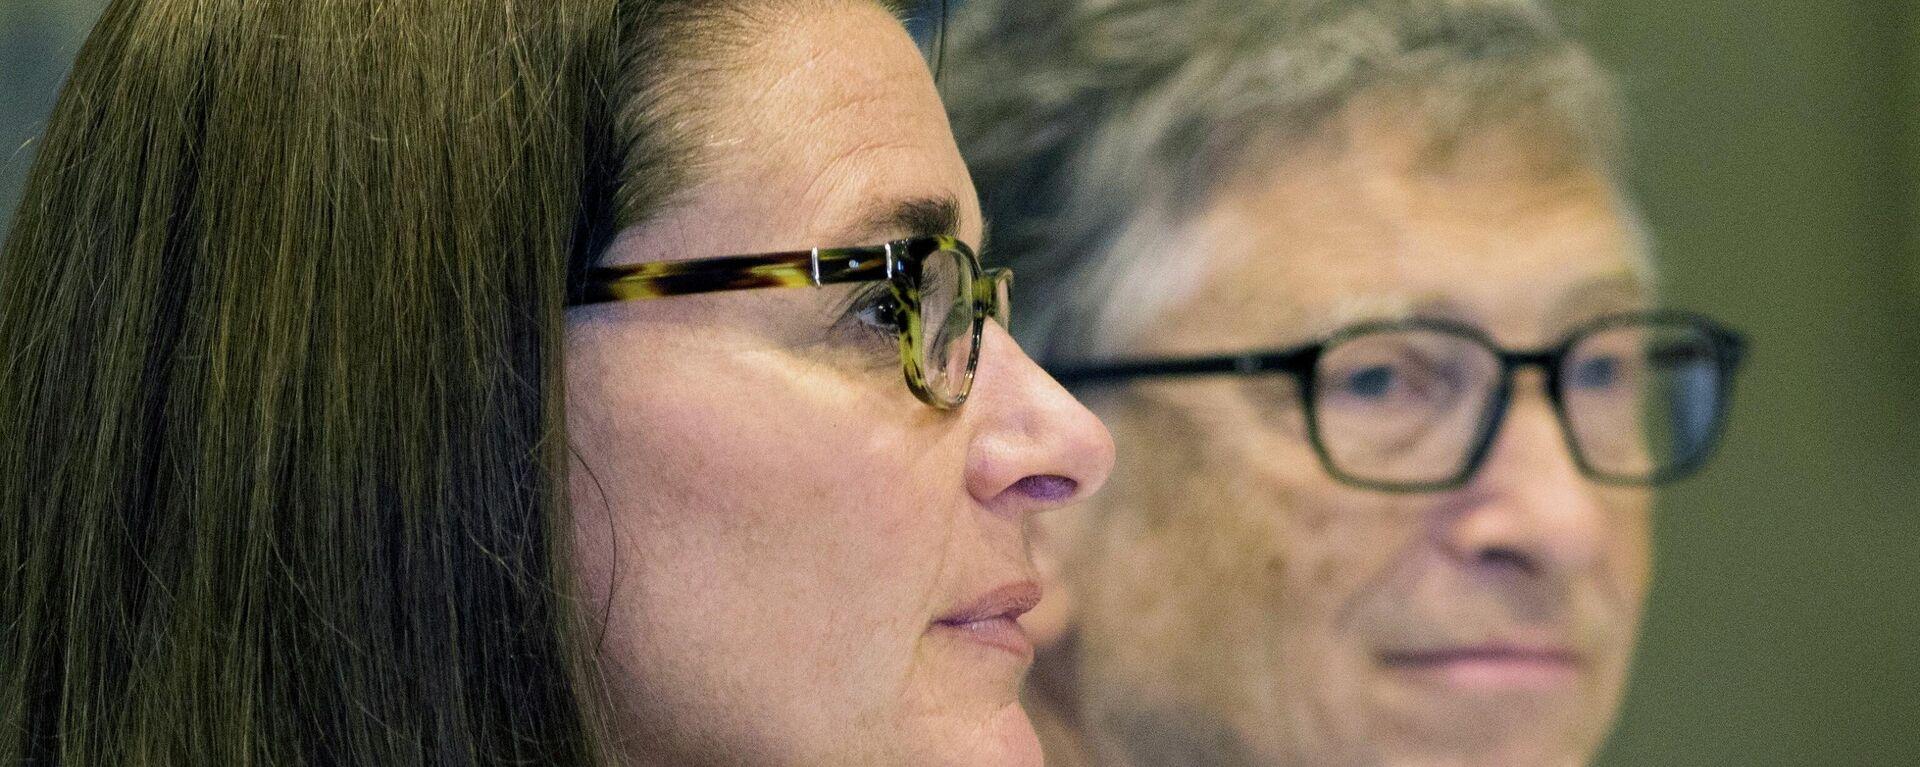 Bill y Melinda Gates en 2015 - Sputnik Mundo, 1920, 13.05.2021